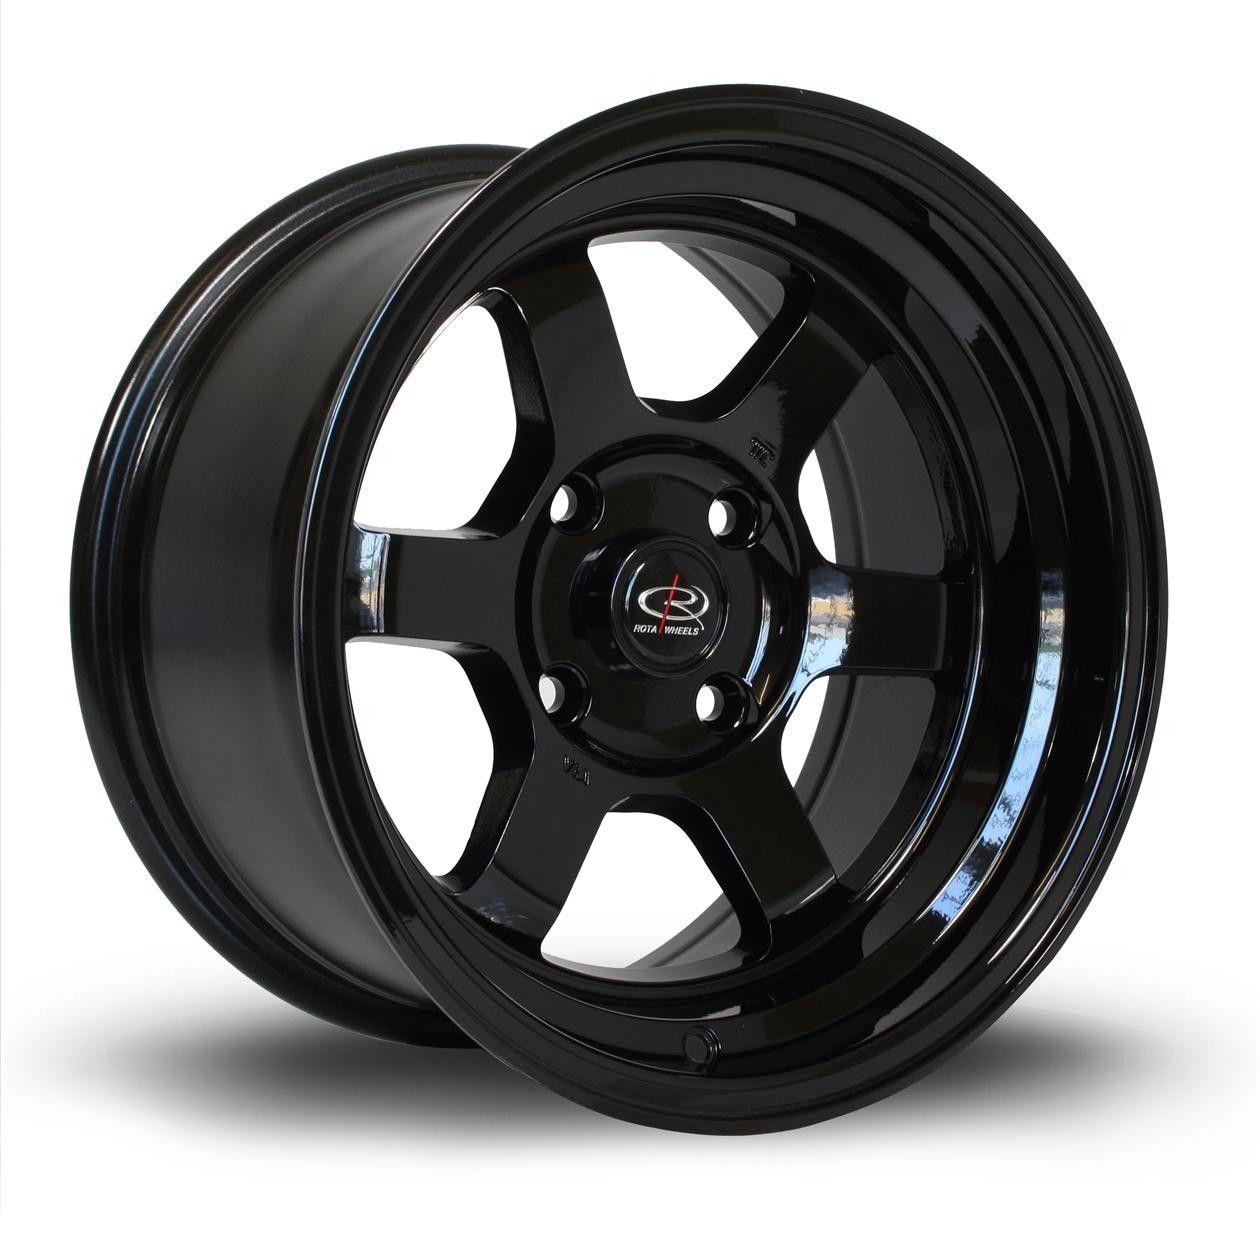 Rota Grid V In Black 15x8 4x100 Et0 Alloy Wheel Wheel Car Wheels